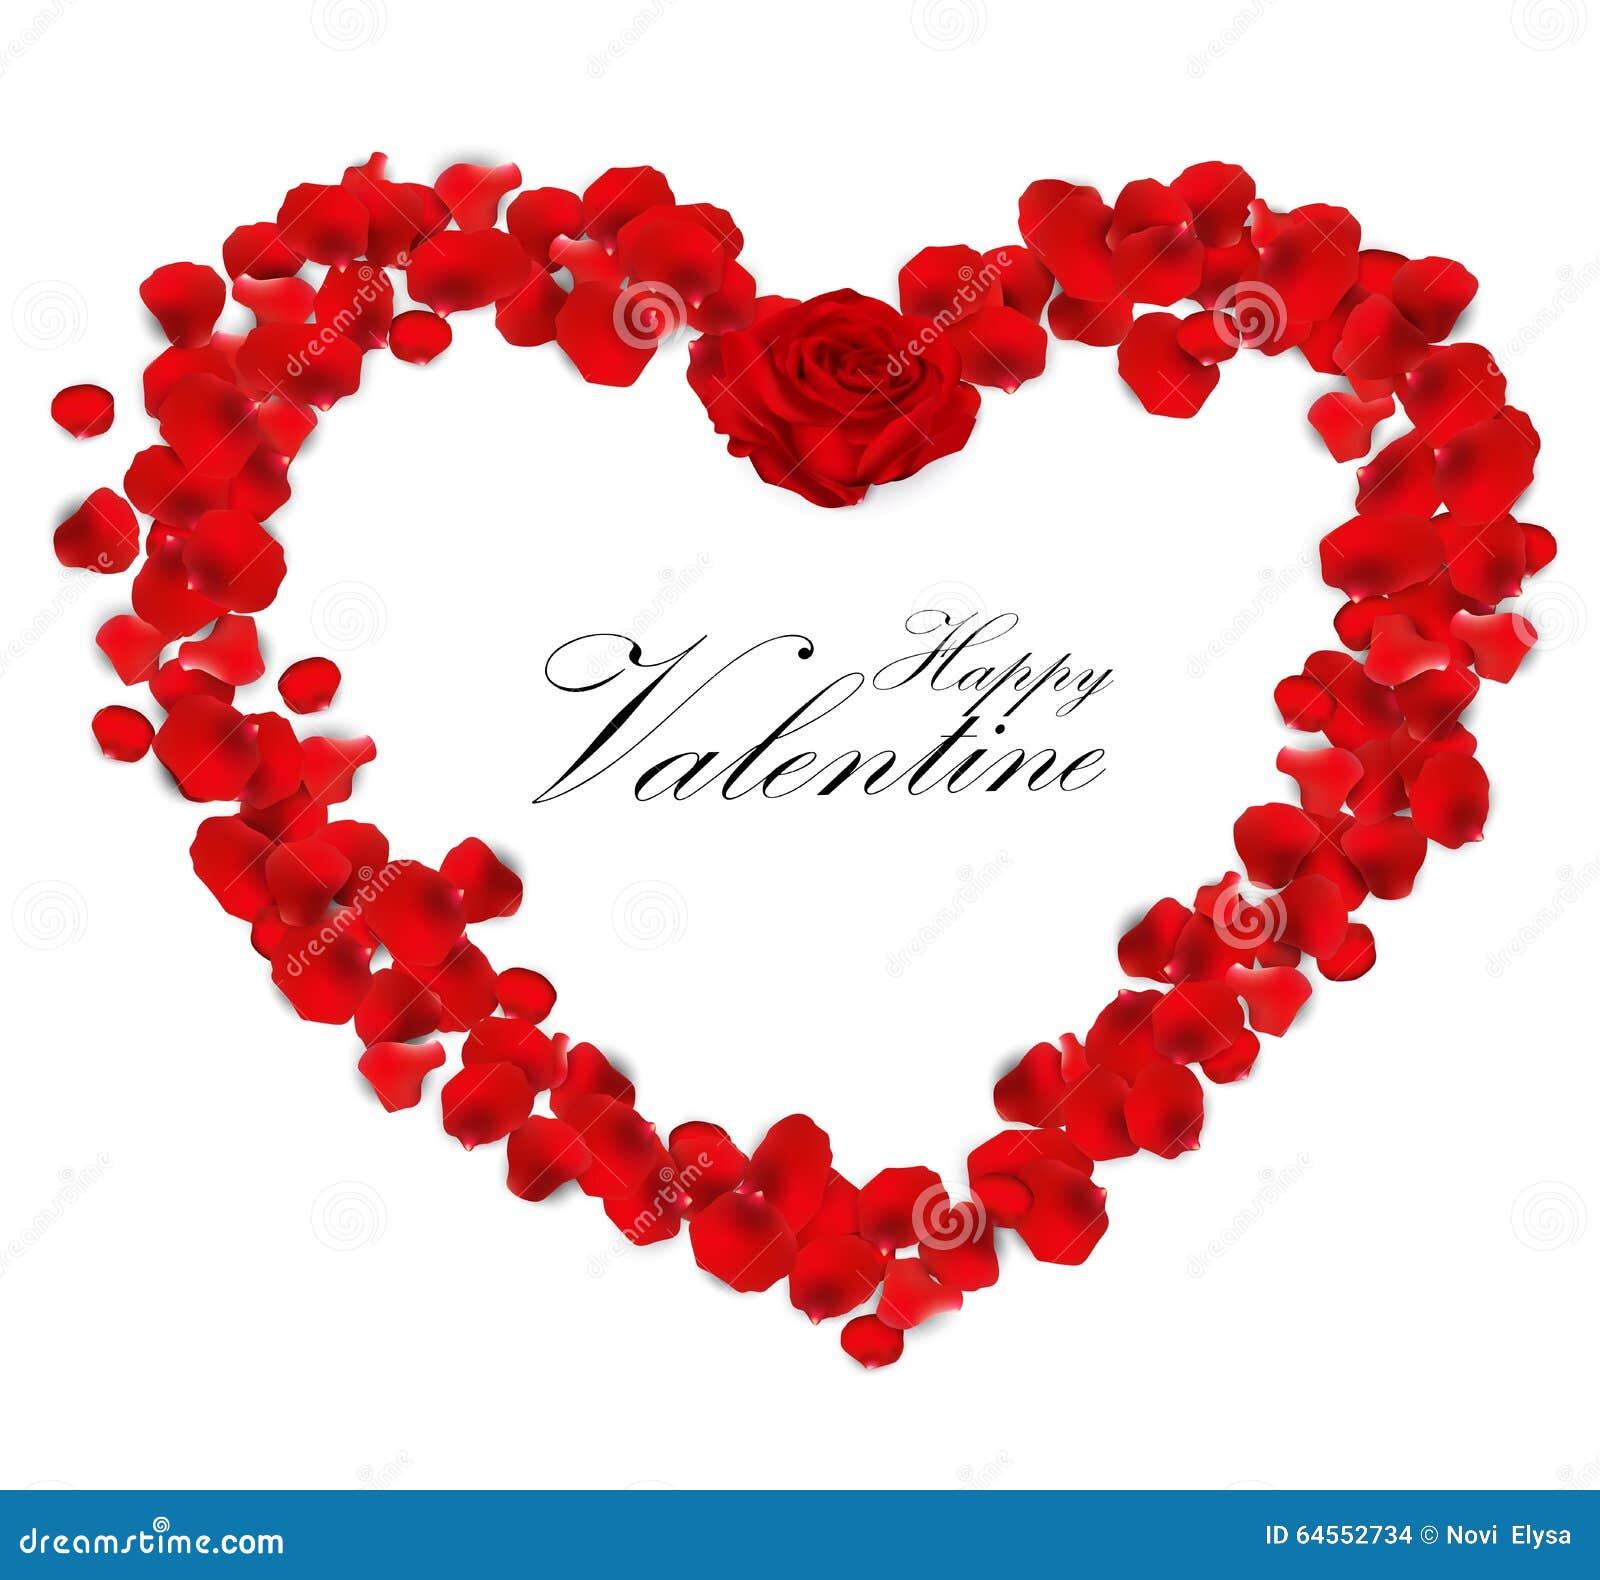 superb coeur saint valentin image #7: coeur    helvia.co